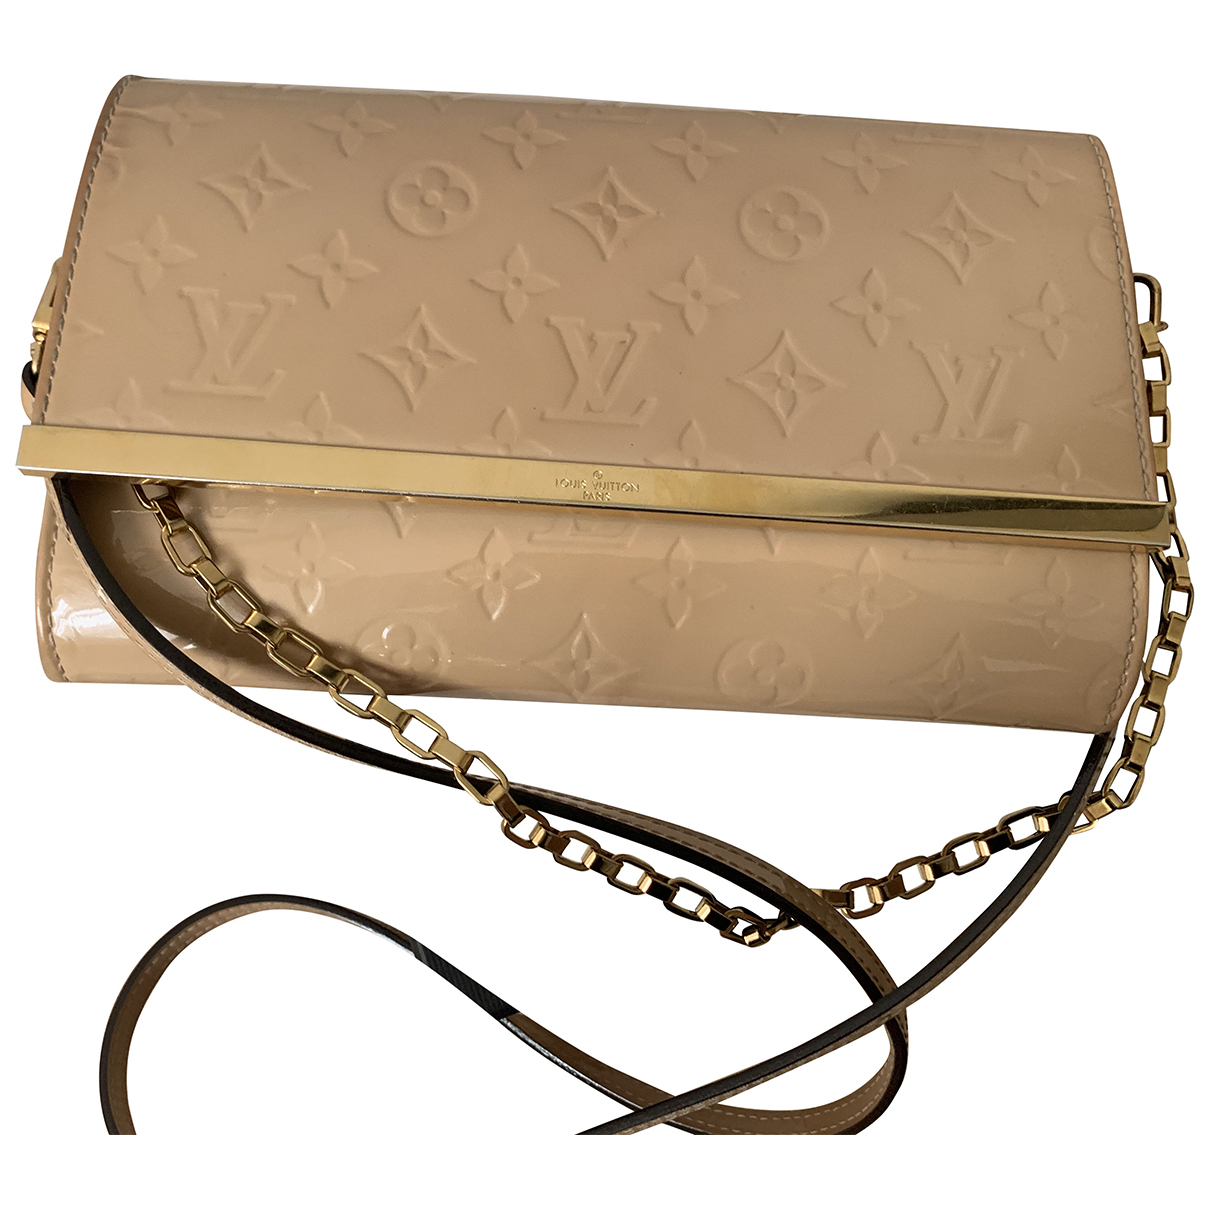 Pochette Ana de Charol Louis Vuitton